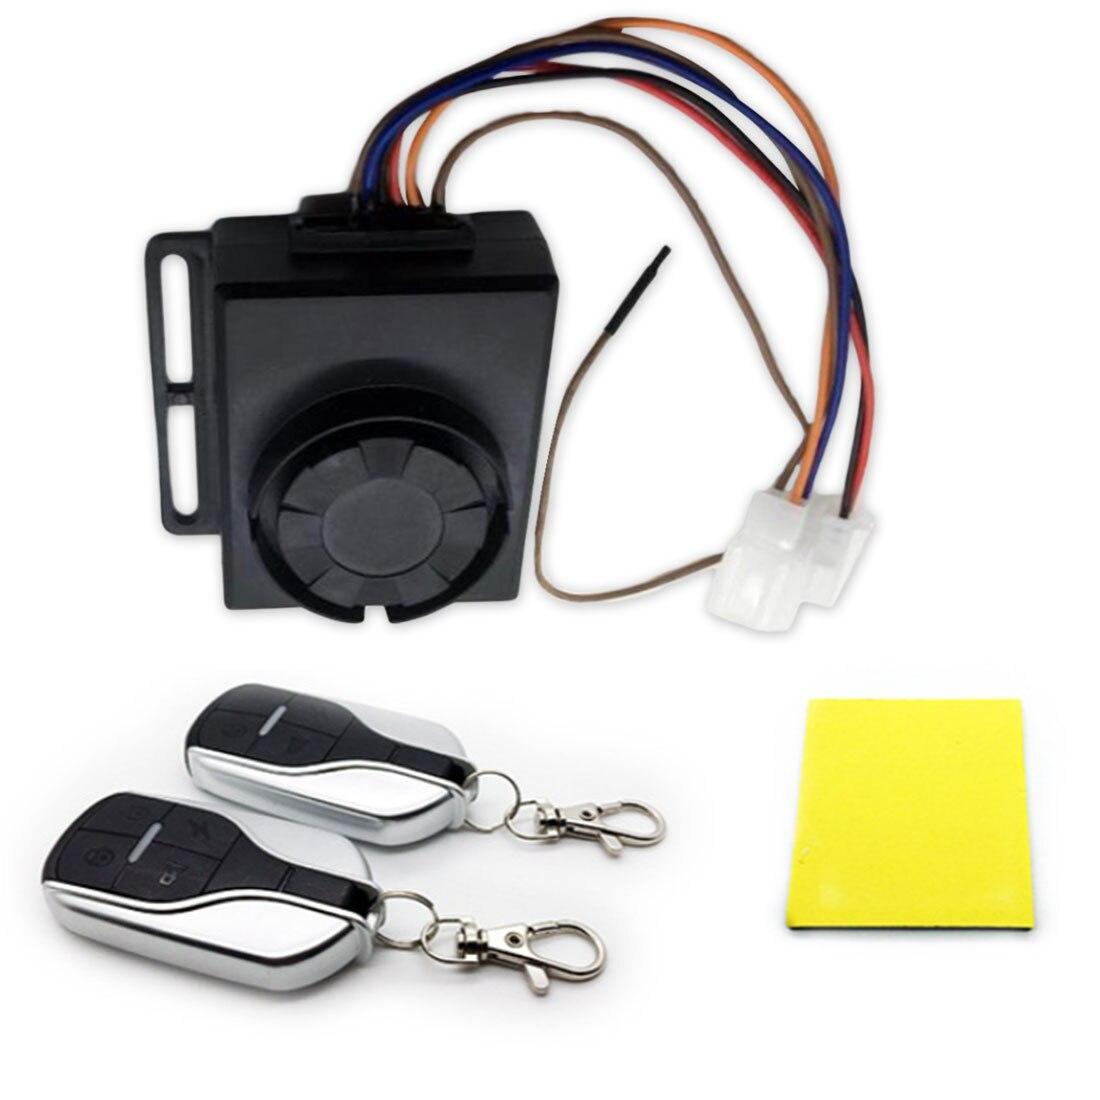 New Arrival Electric Car Alarm Electric Car Alarm With Start Lock Motor 48V60V72V2 Remote Control Waterproof